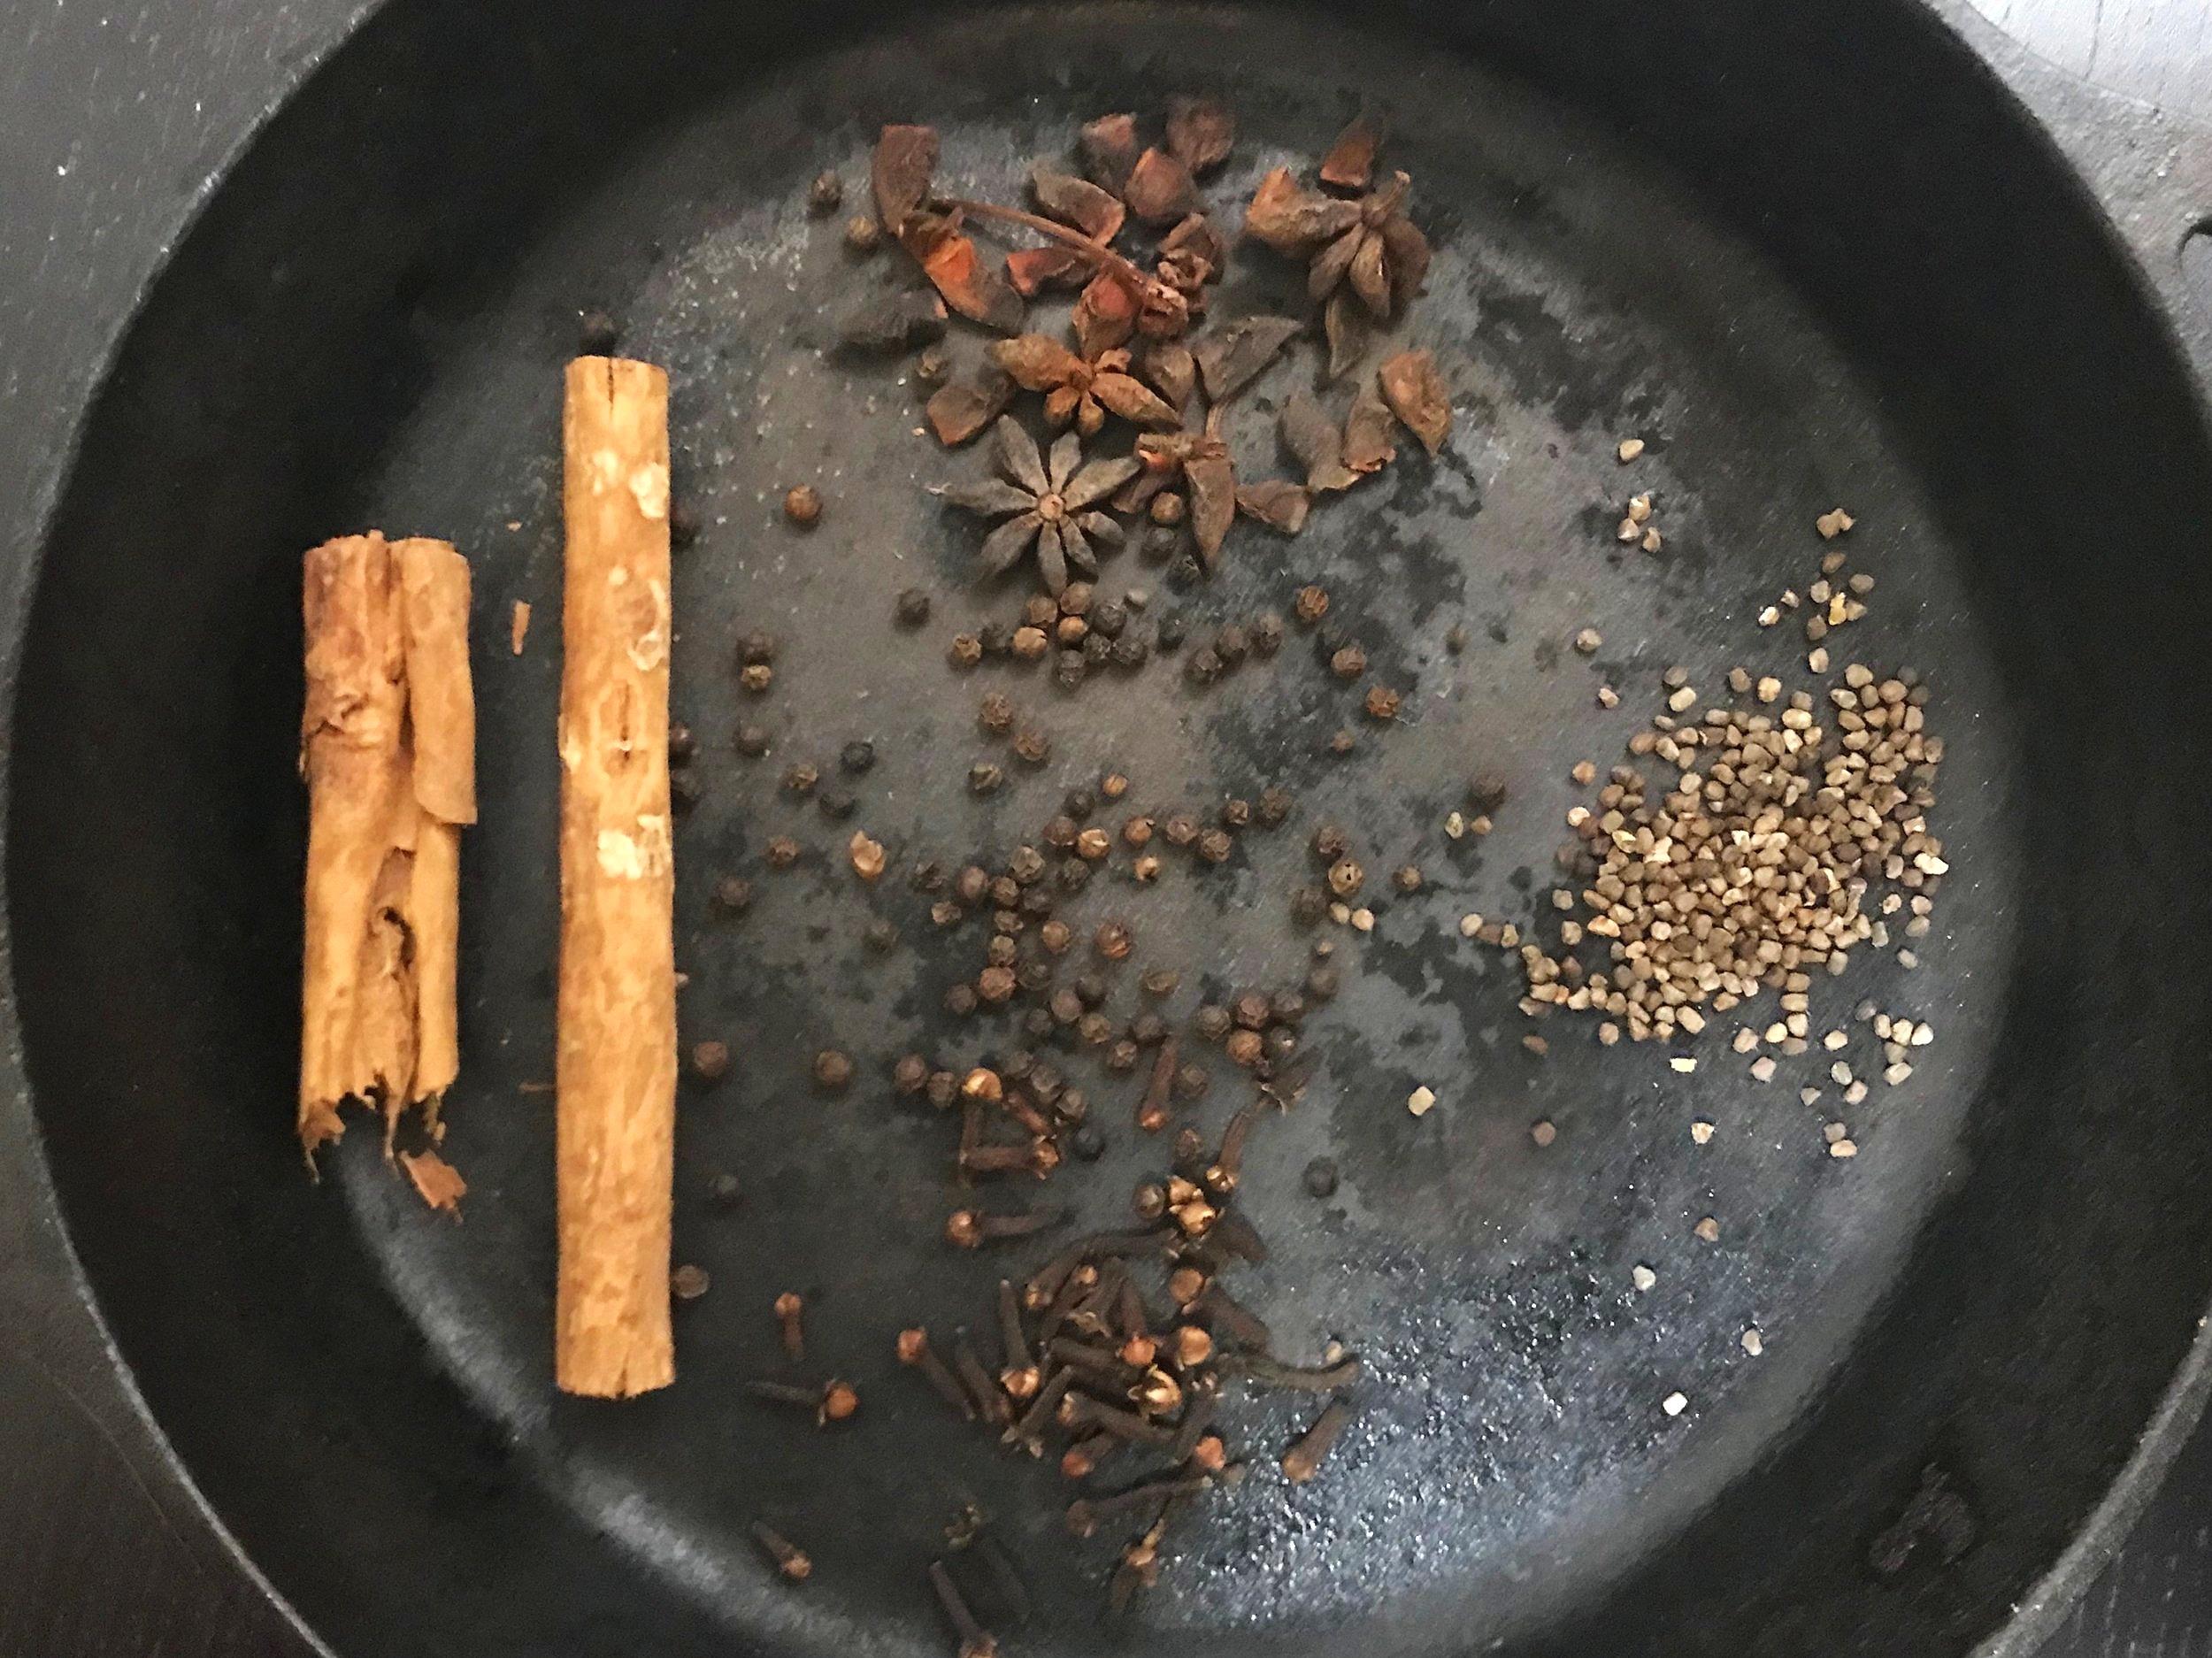 From left to right, clockwise: cinnamon sticks, star anise, cardamom, cloves. Center: peppercorn